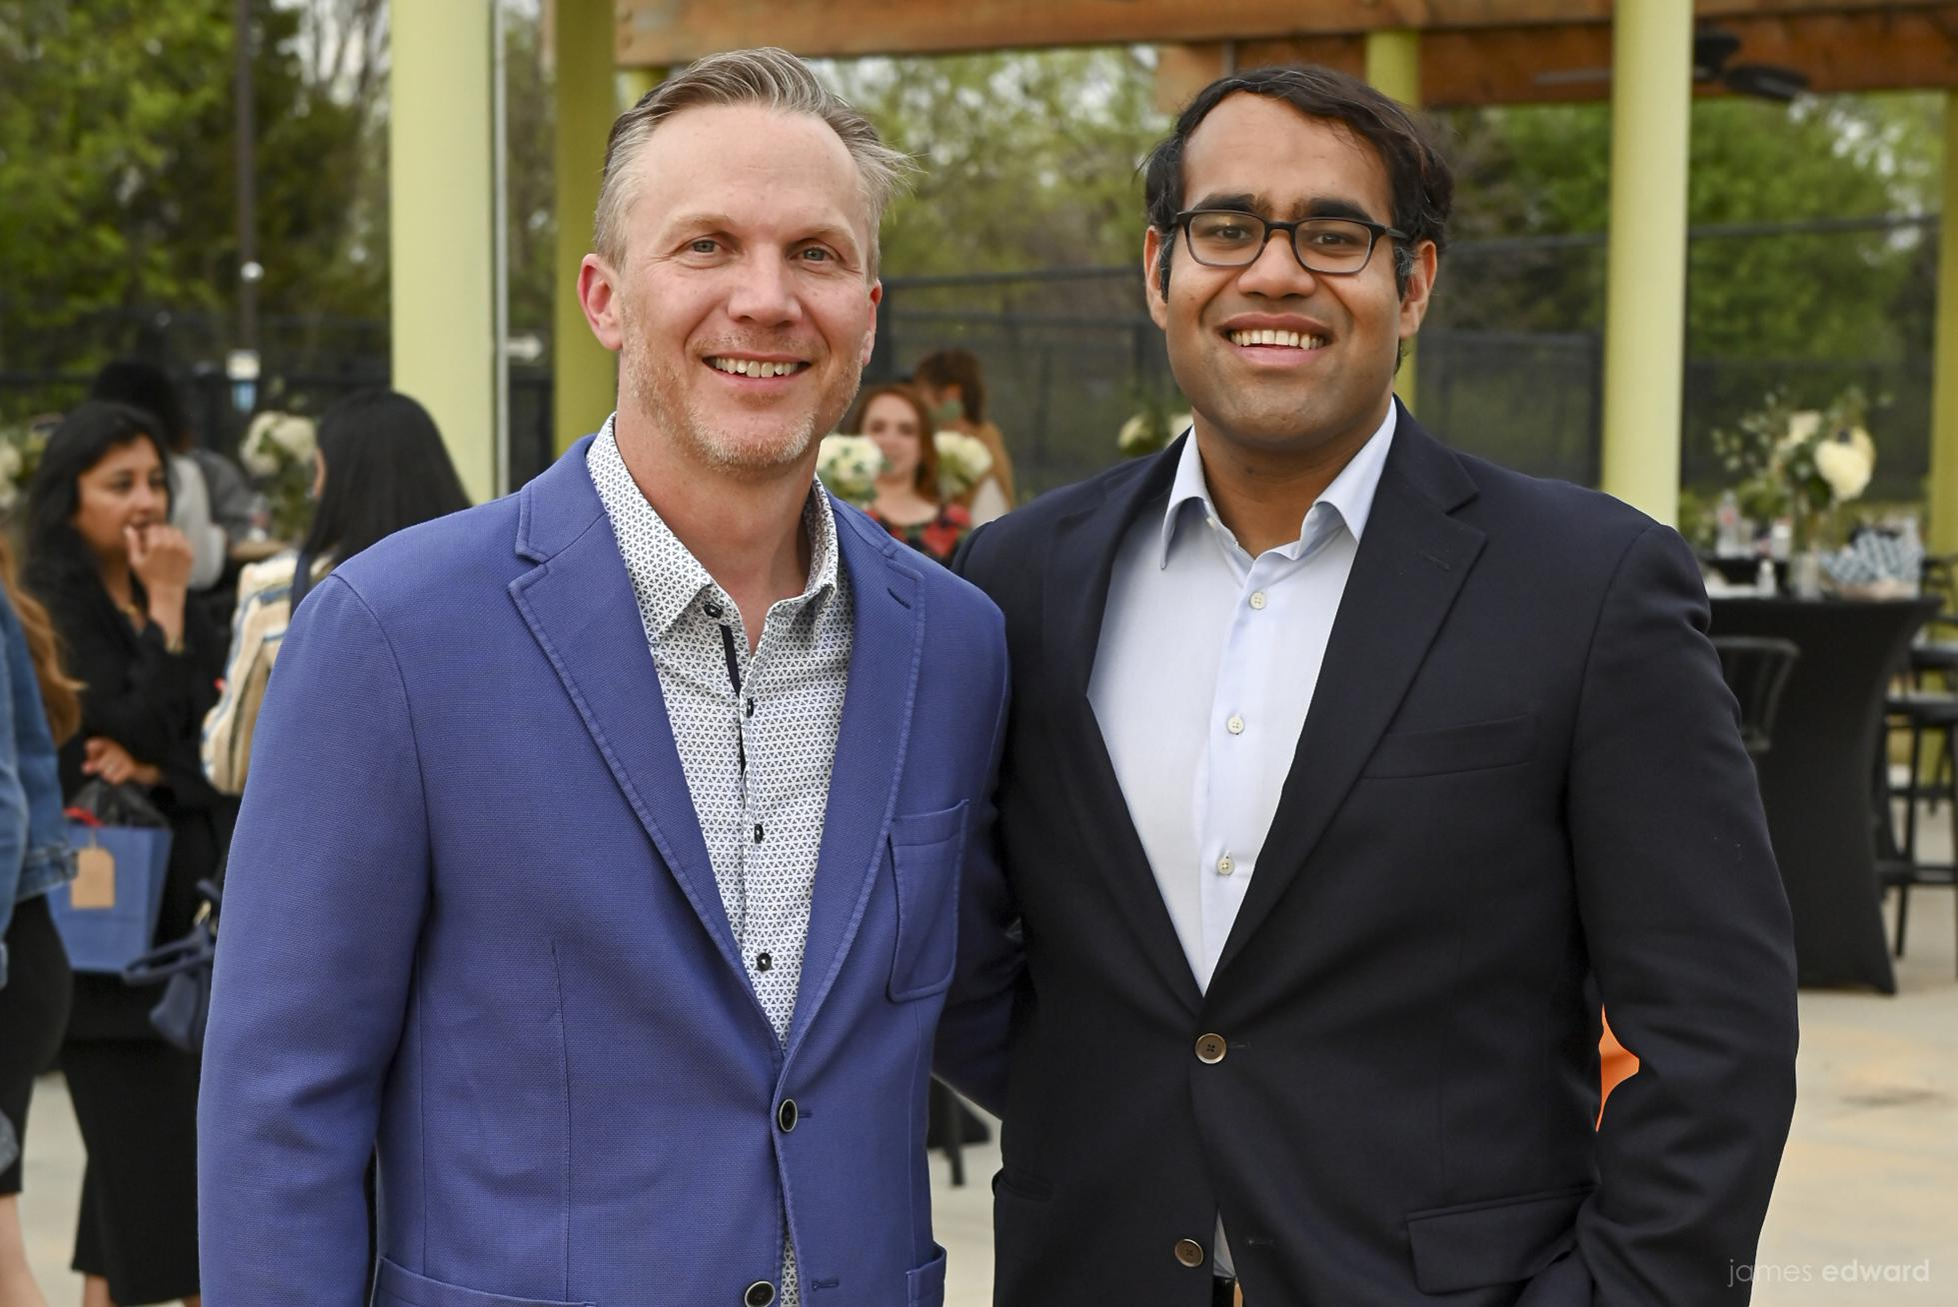 Shiftsmart cofounders Patrick Brandt and Aakash Kumar